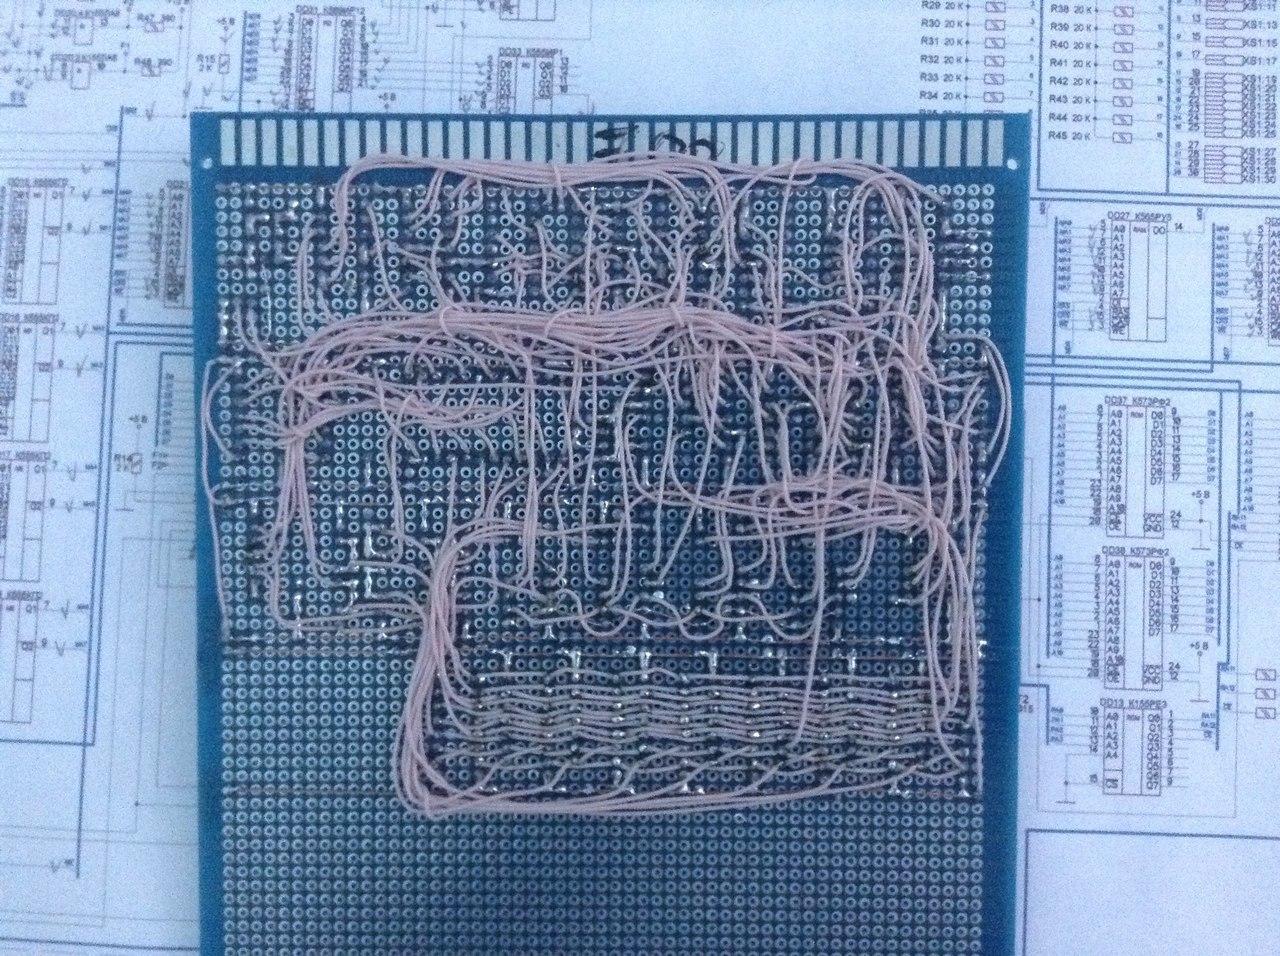 вики схема клавиатуры компьютера